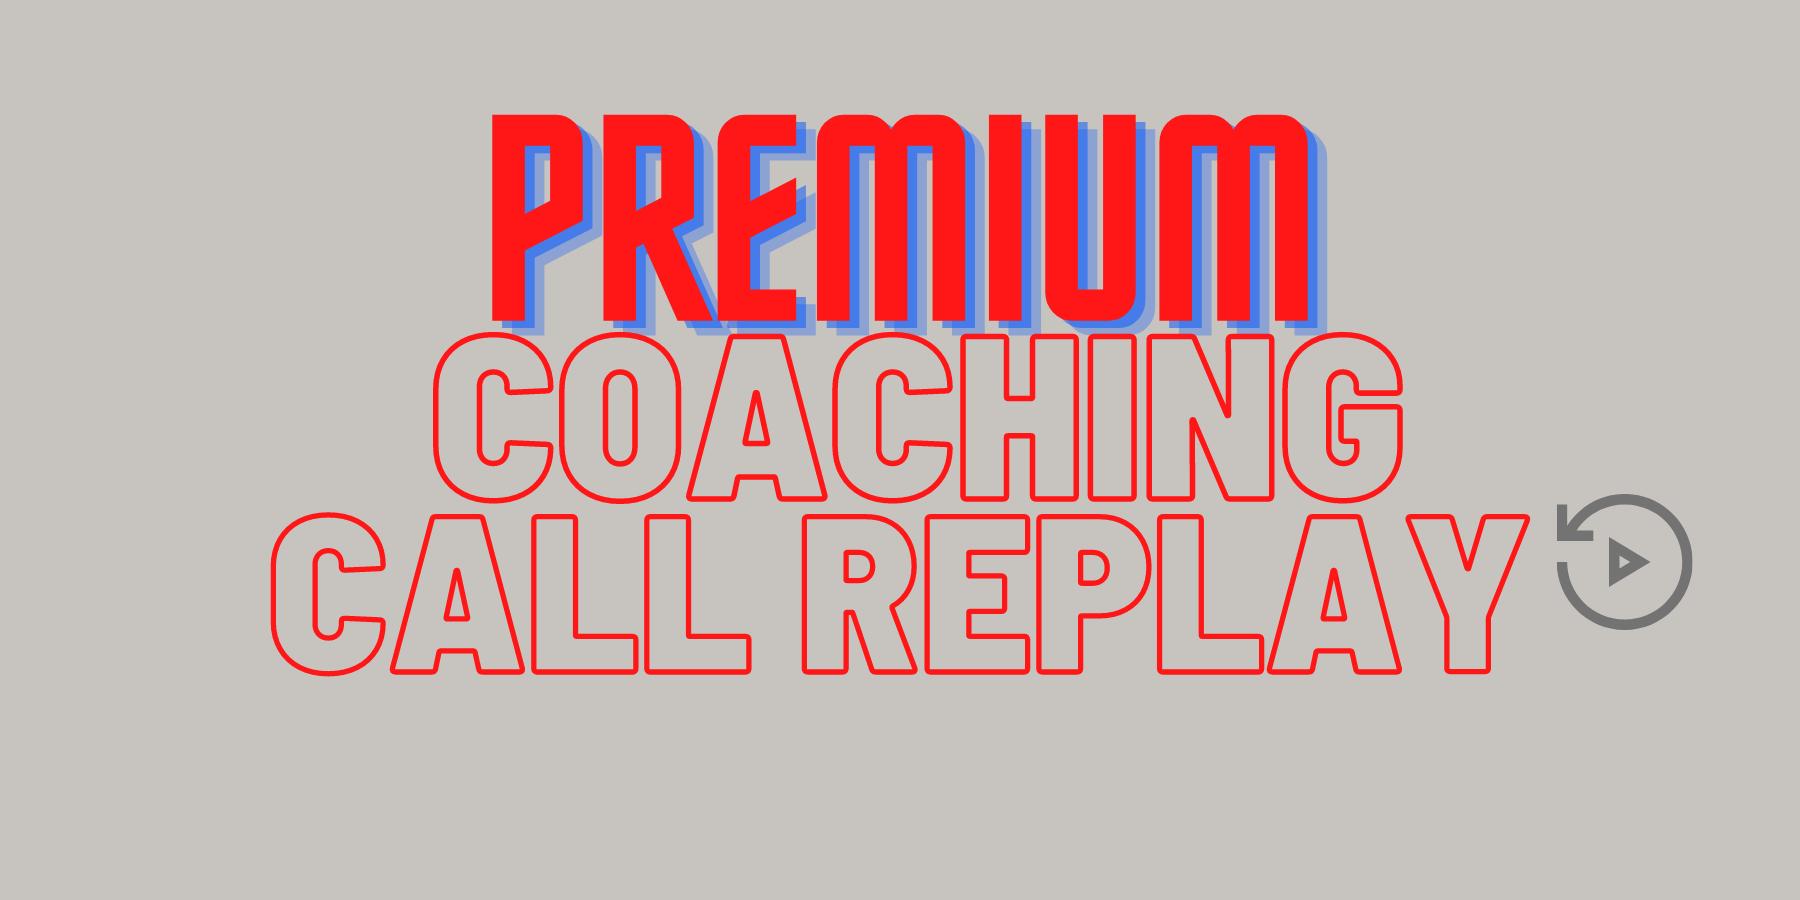 Premium Coaching Call Replays